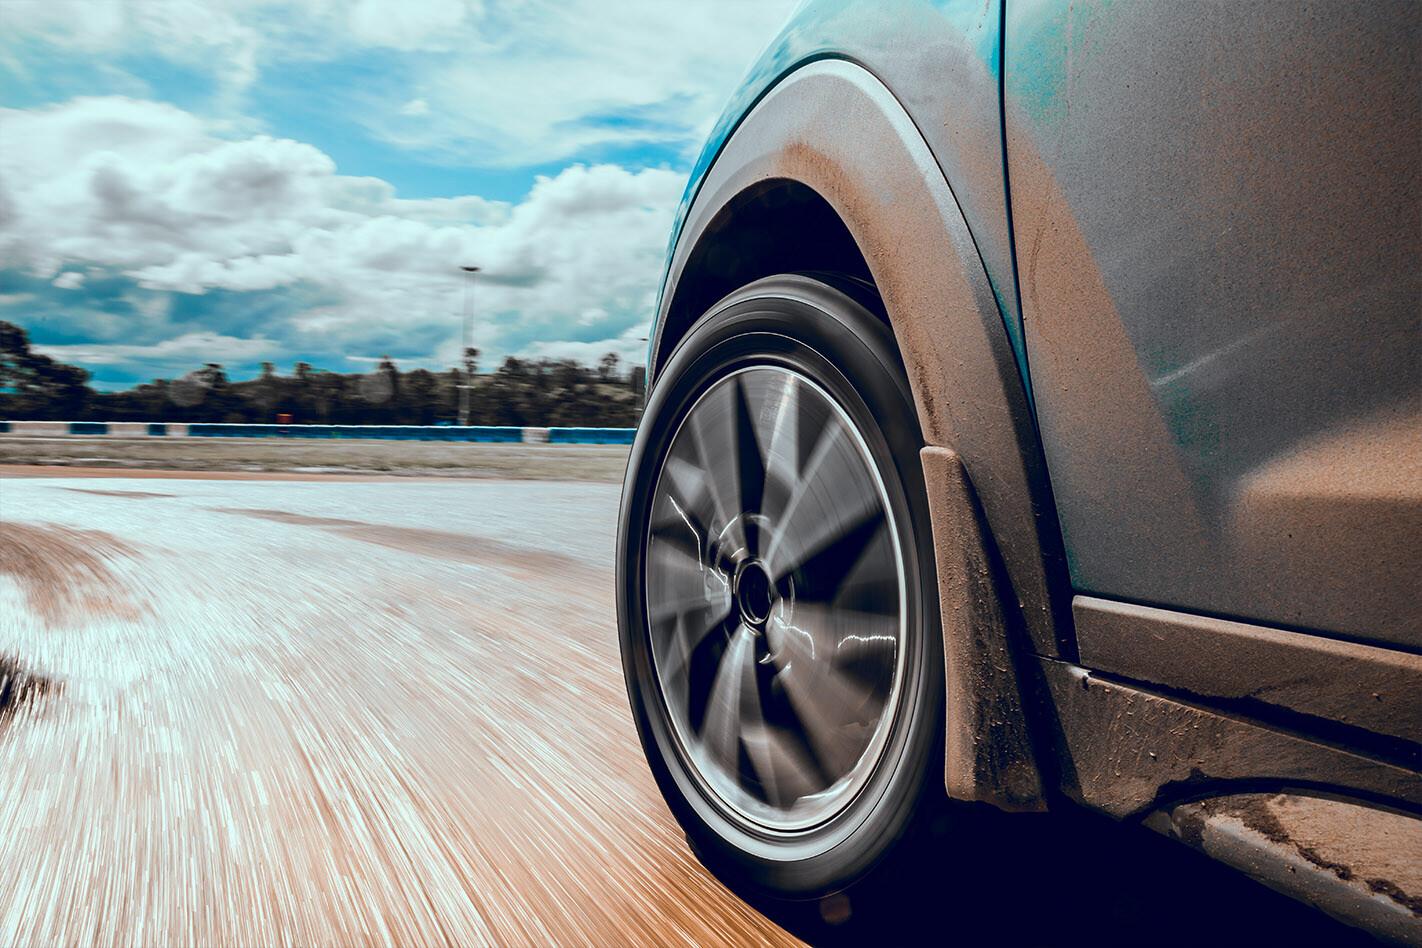 2020 Wheels Tyre Test Wet Cornering 2 Jpg